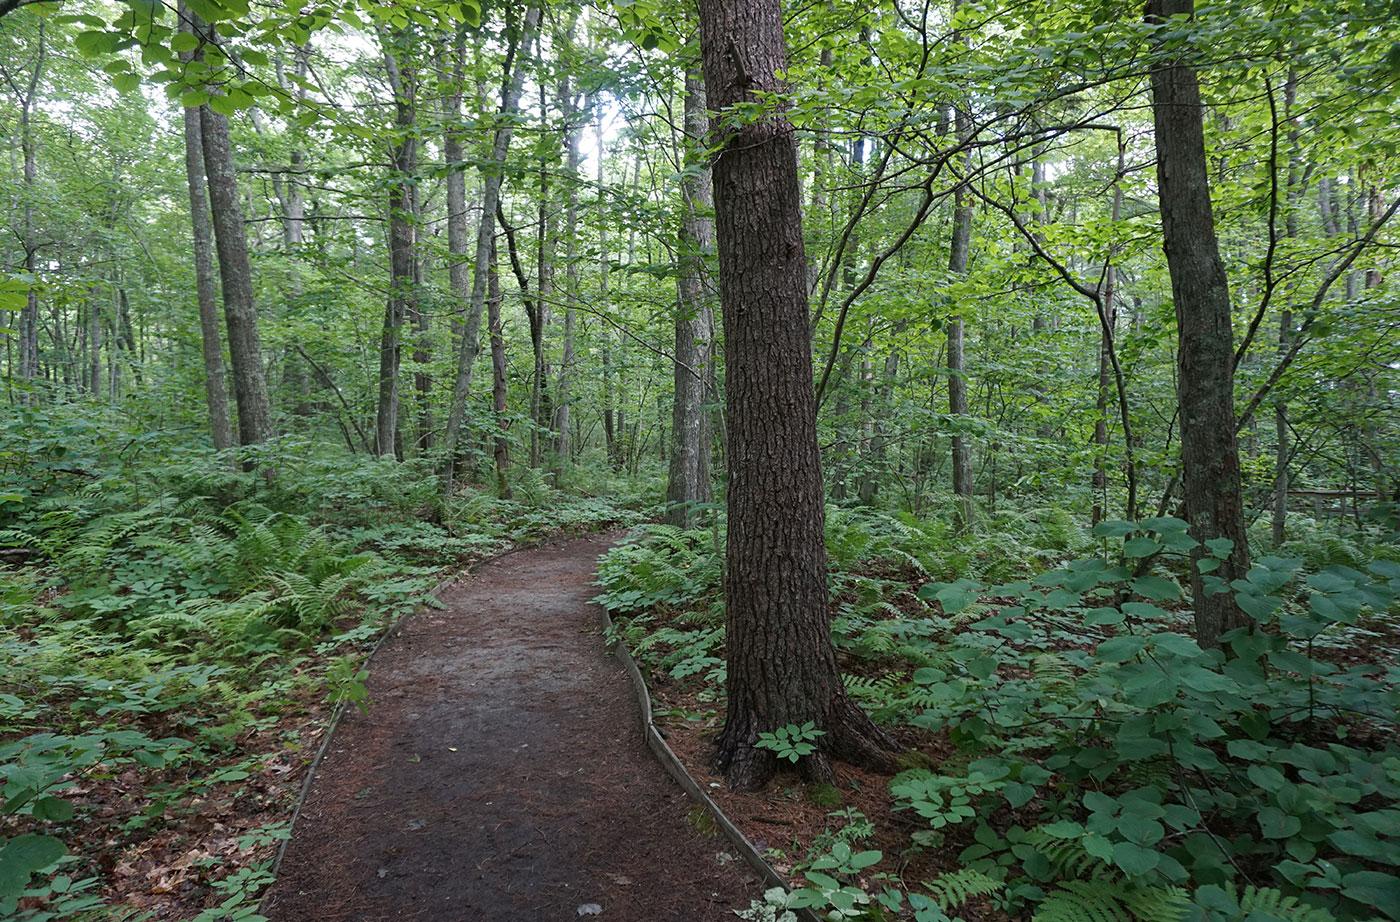 trees on Rachel Carson Trail